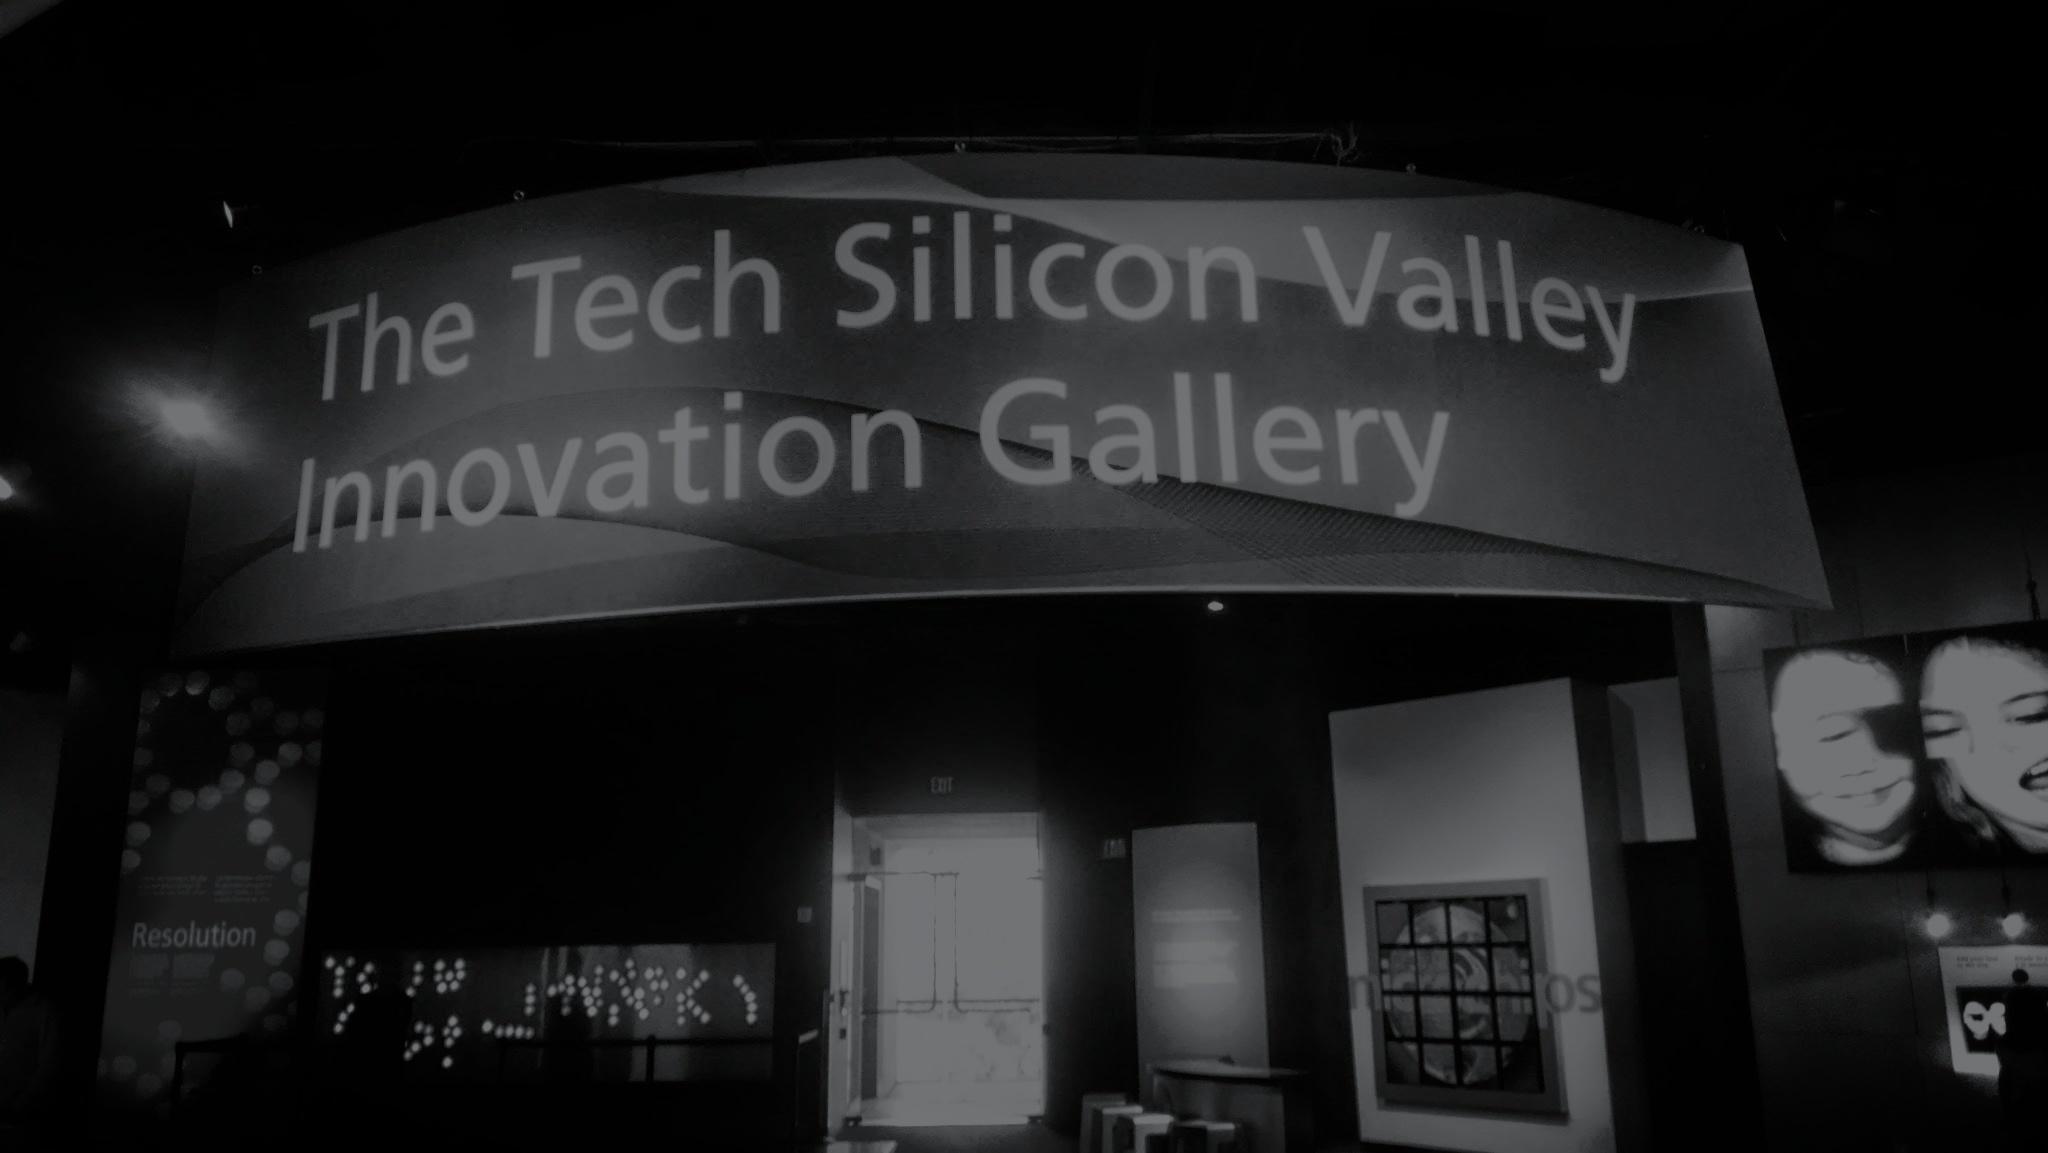 the tech museum